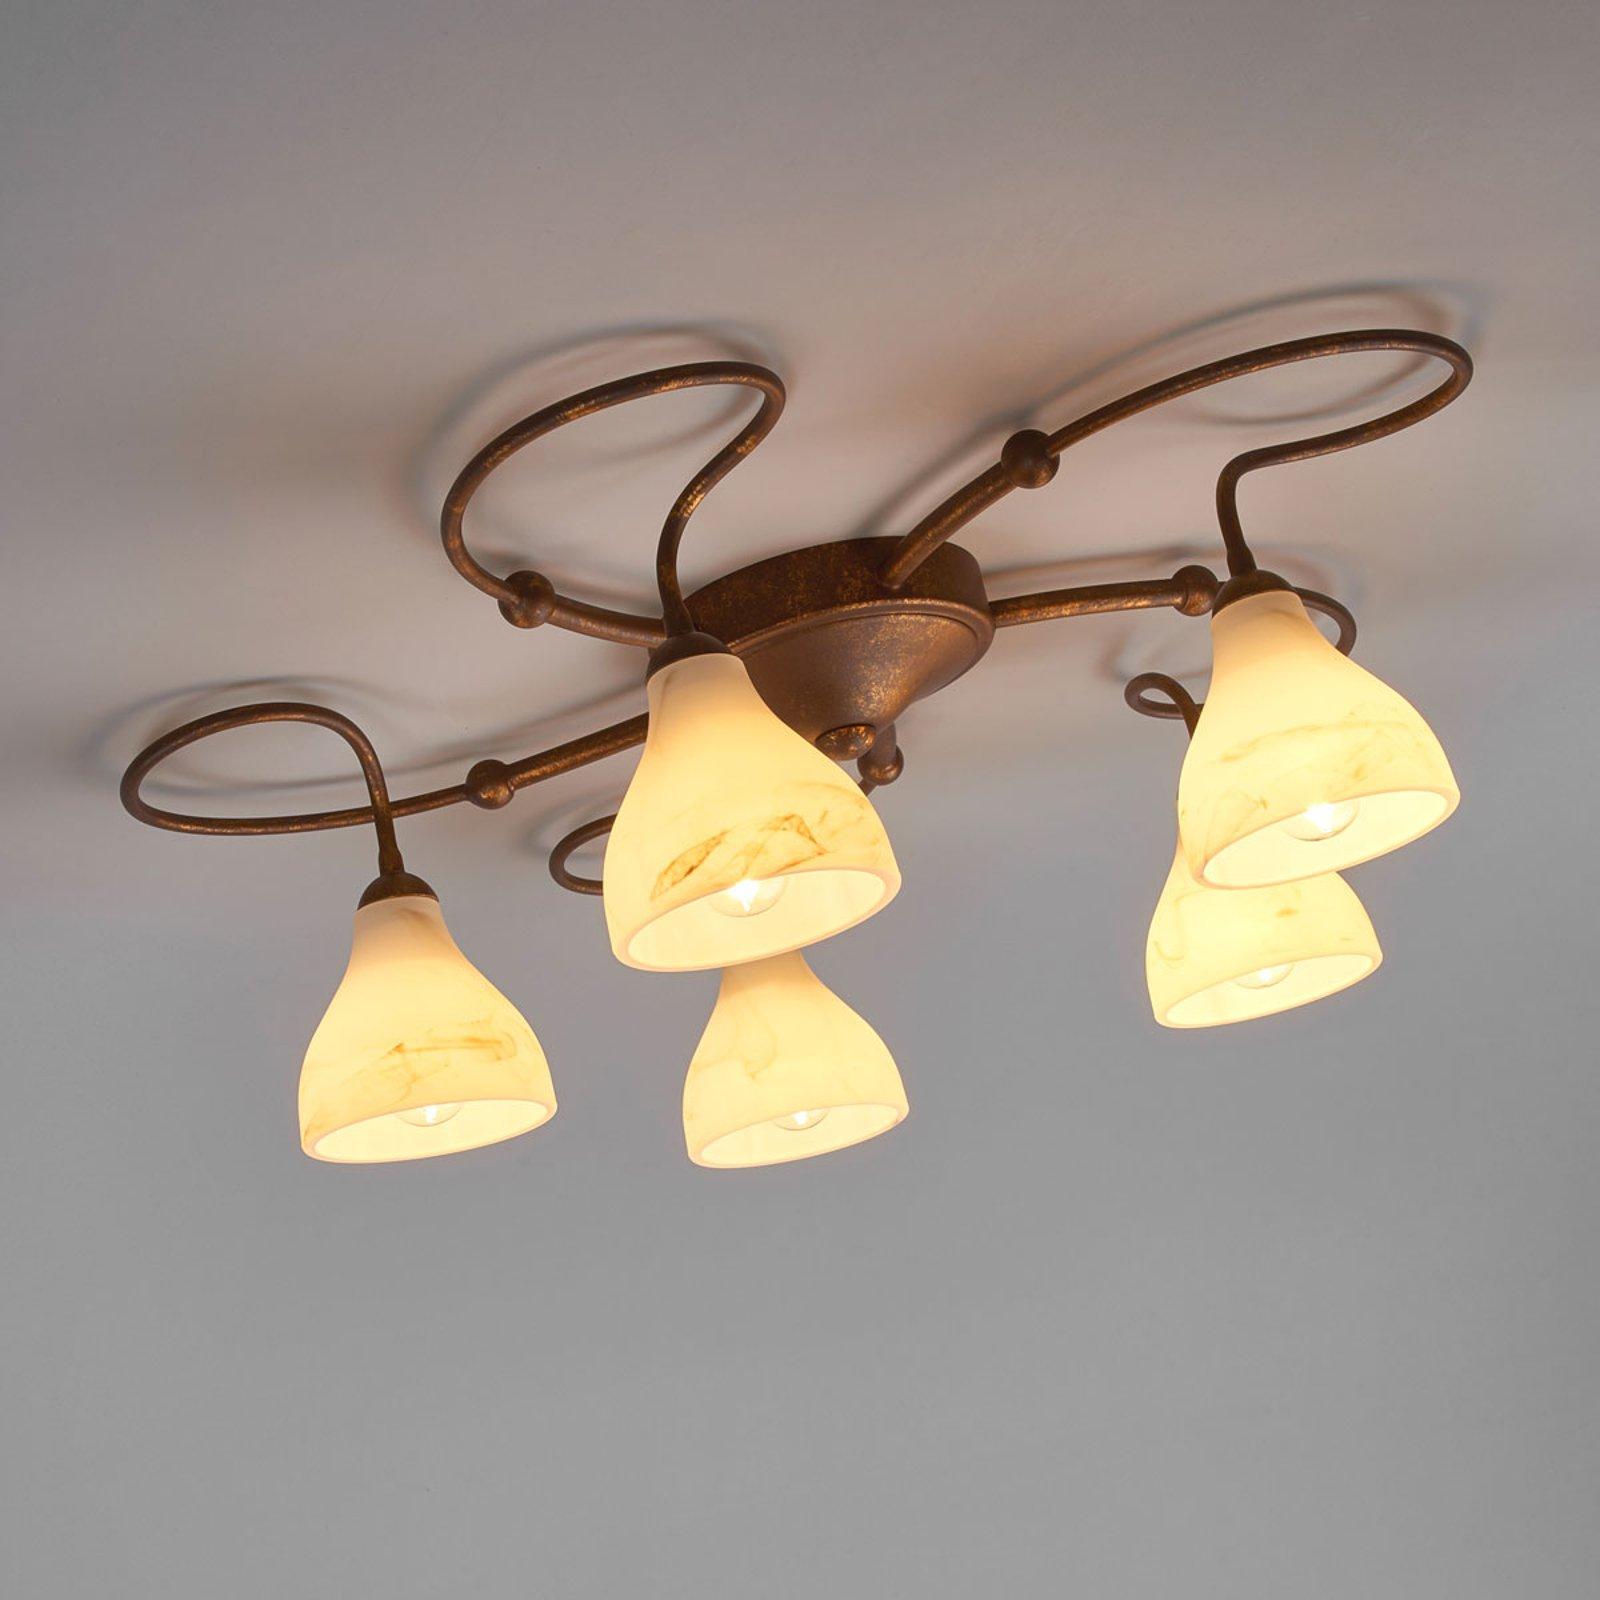 Rustikk taklampe Mattia med fem lys